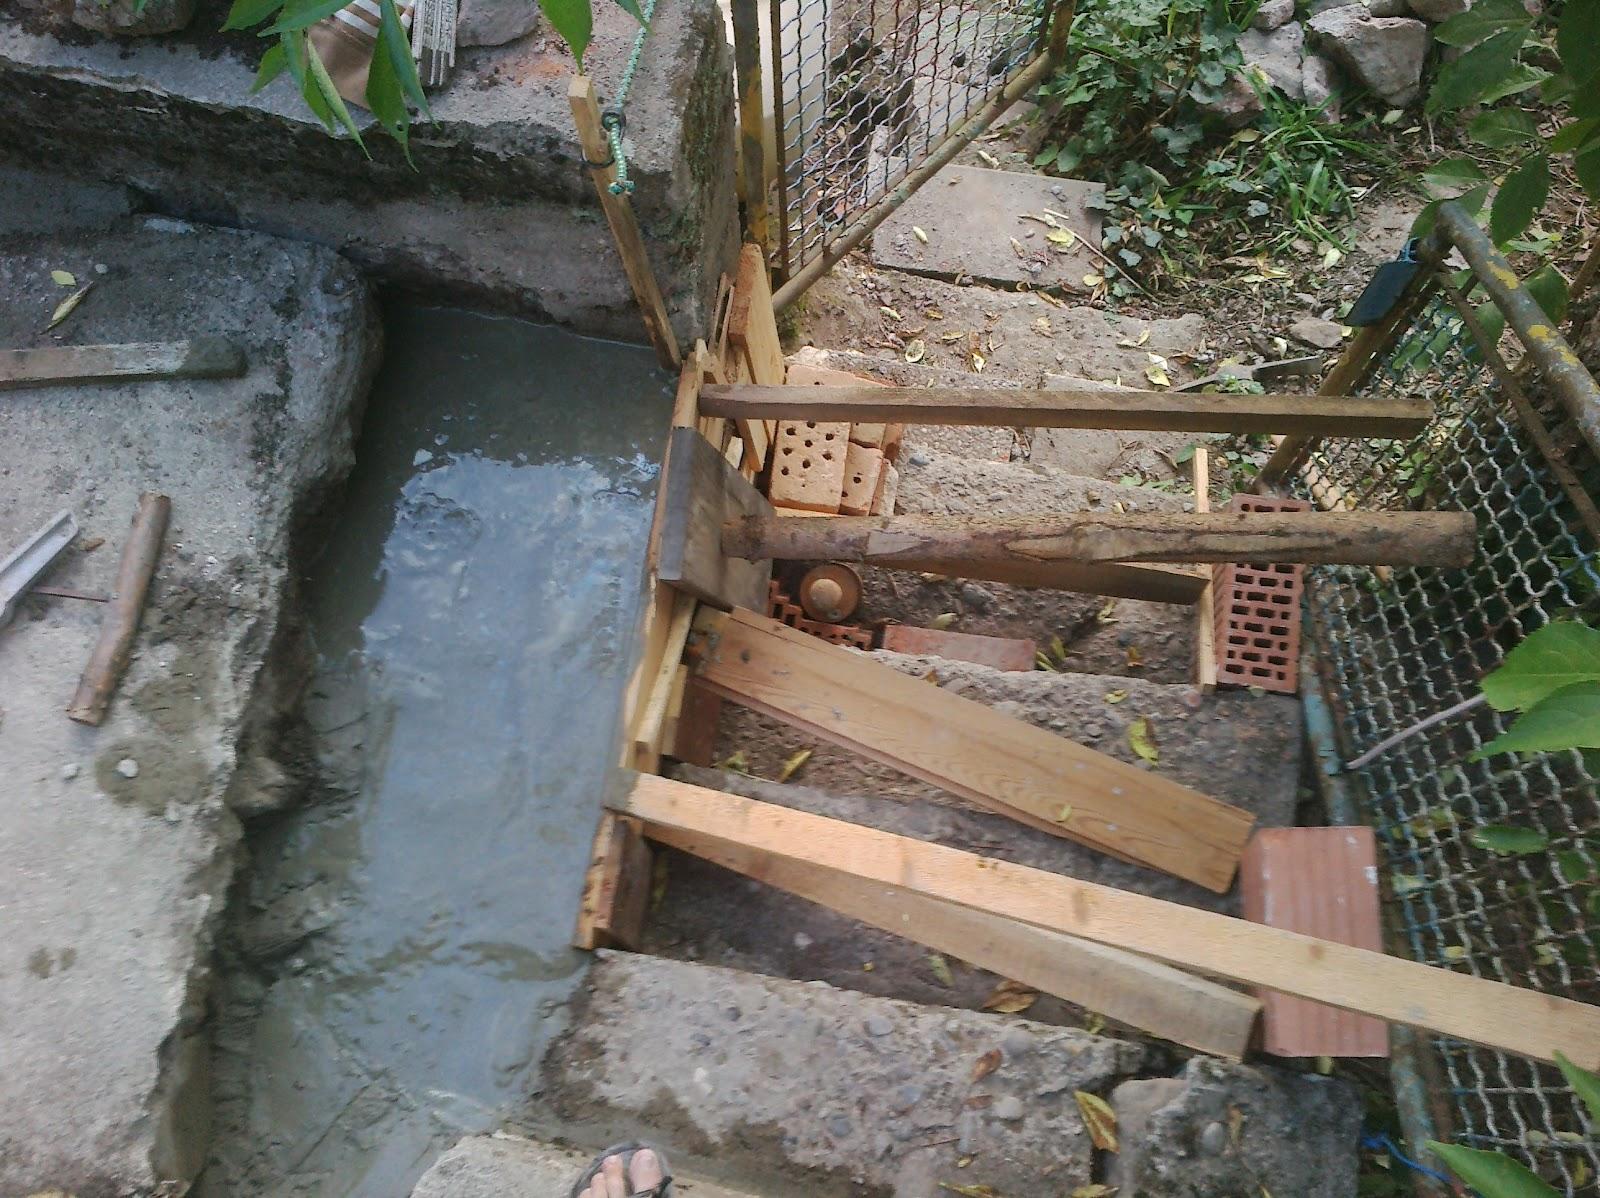 schalung fr treppe bauen cheap schalung fr treppe bauen